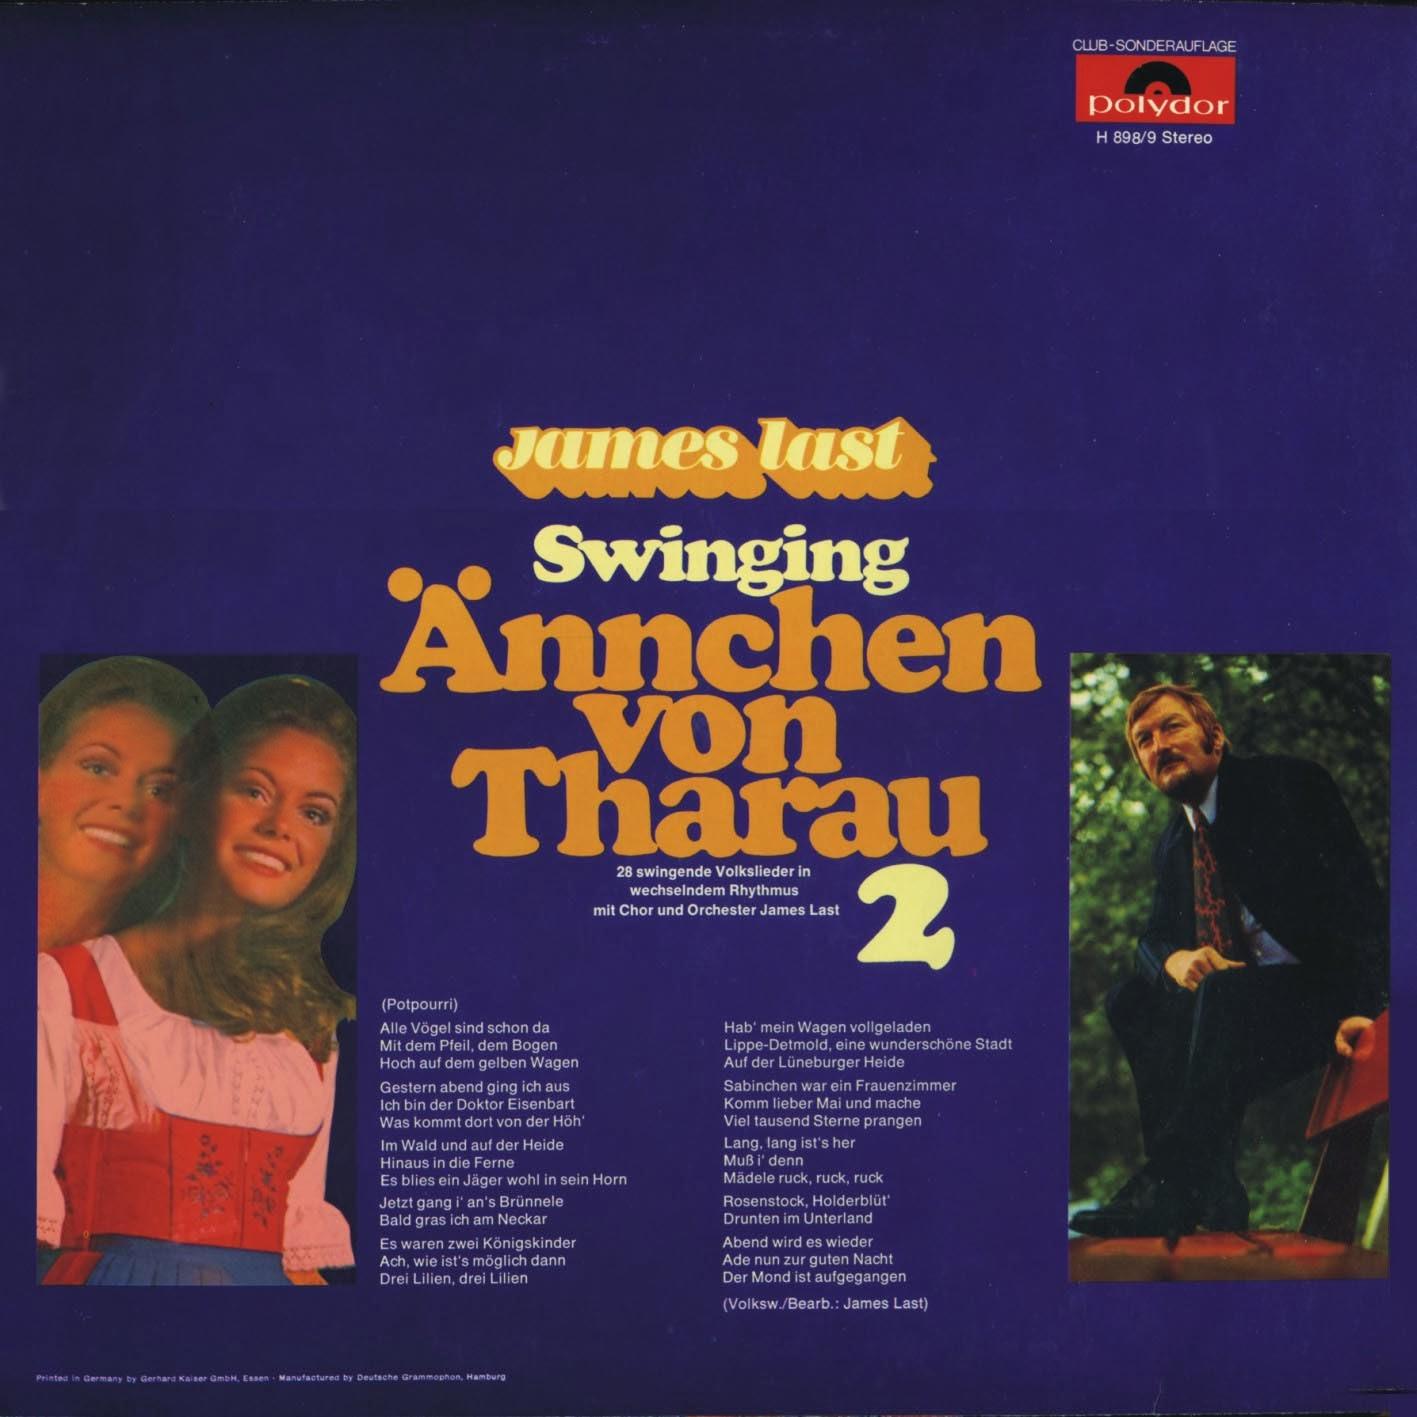 Swinging james last